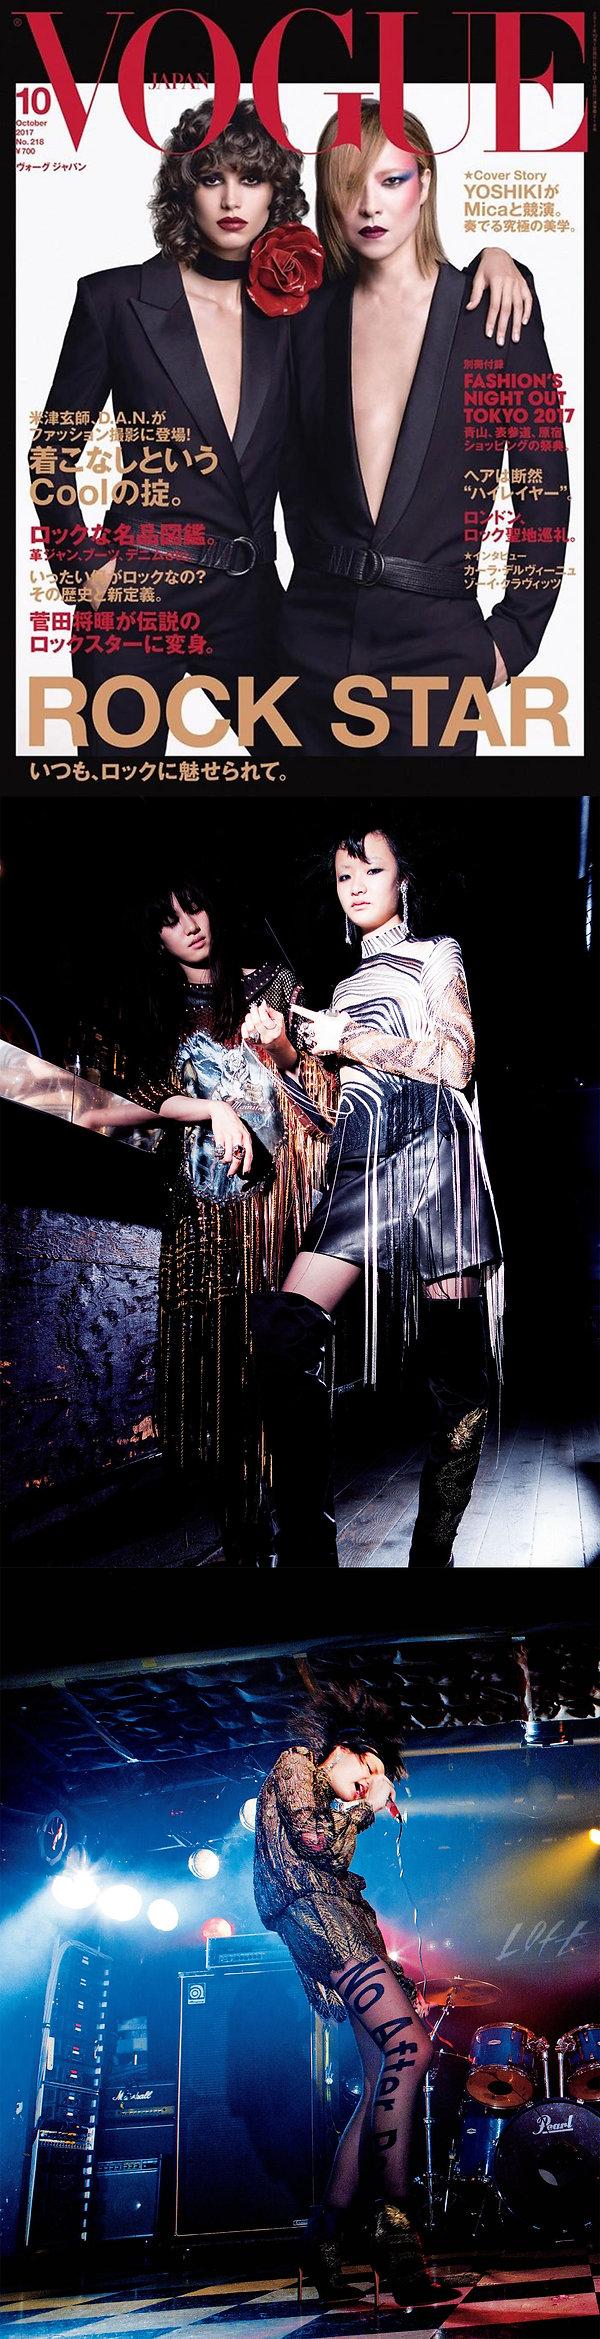 Vogue_Japan_October_2017.jpg